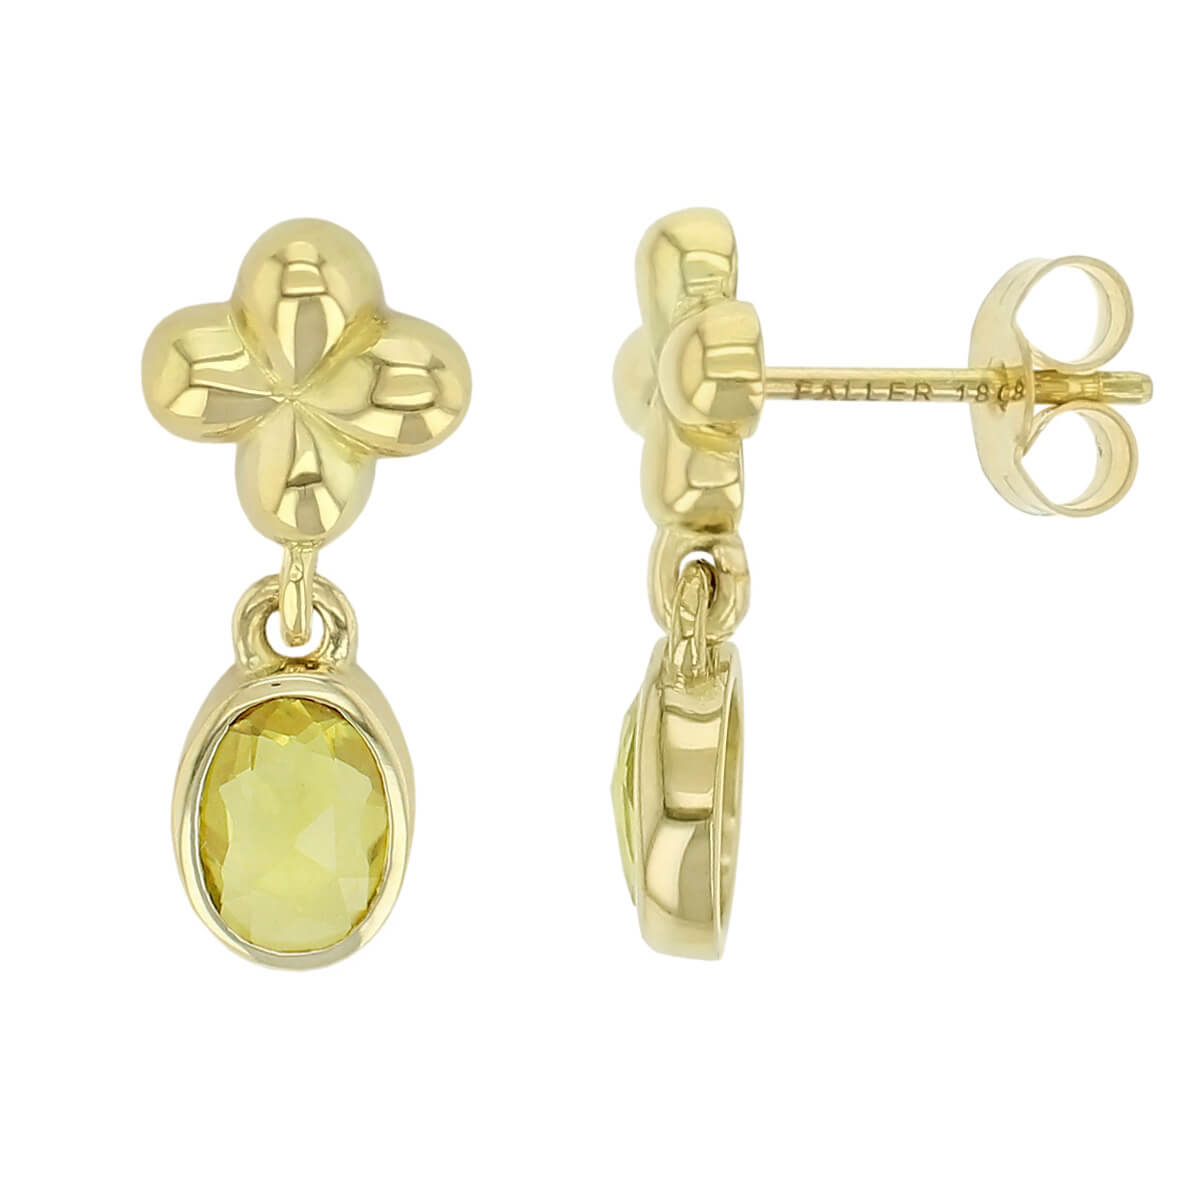 Kandy 18ct yellow gold yellow oval rose cut sapphire gemstone ladies petal cross link drop earrings, designer jewellery, gem, jewelry, handmade by Faller, Londonderry, Northern Ireland, Irish hand crafted